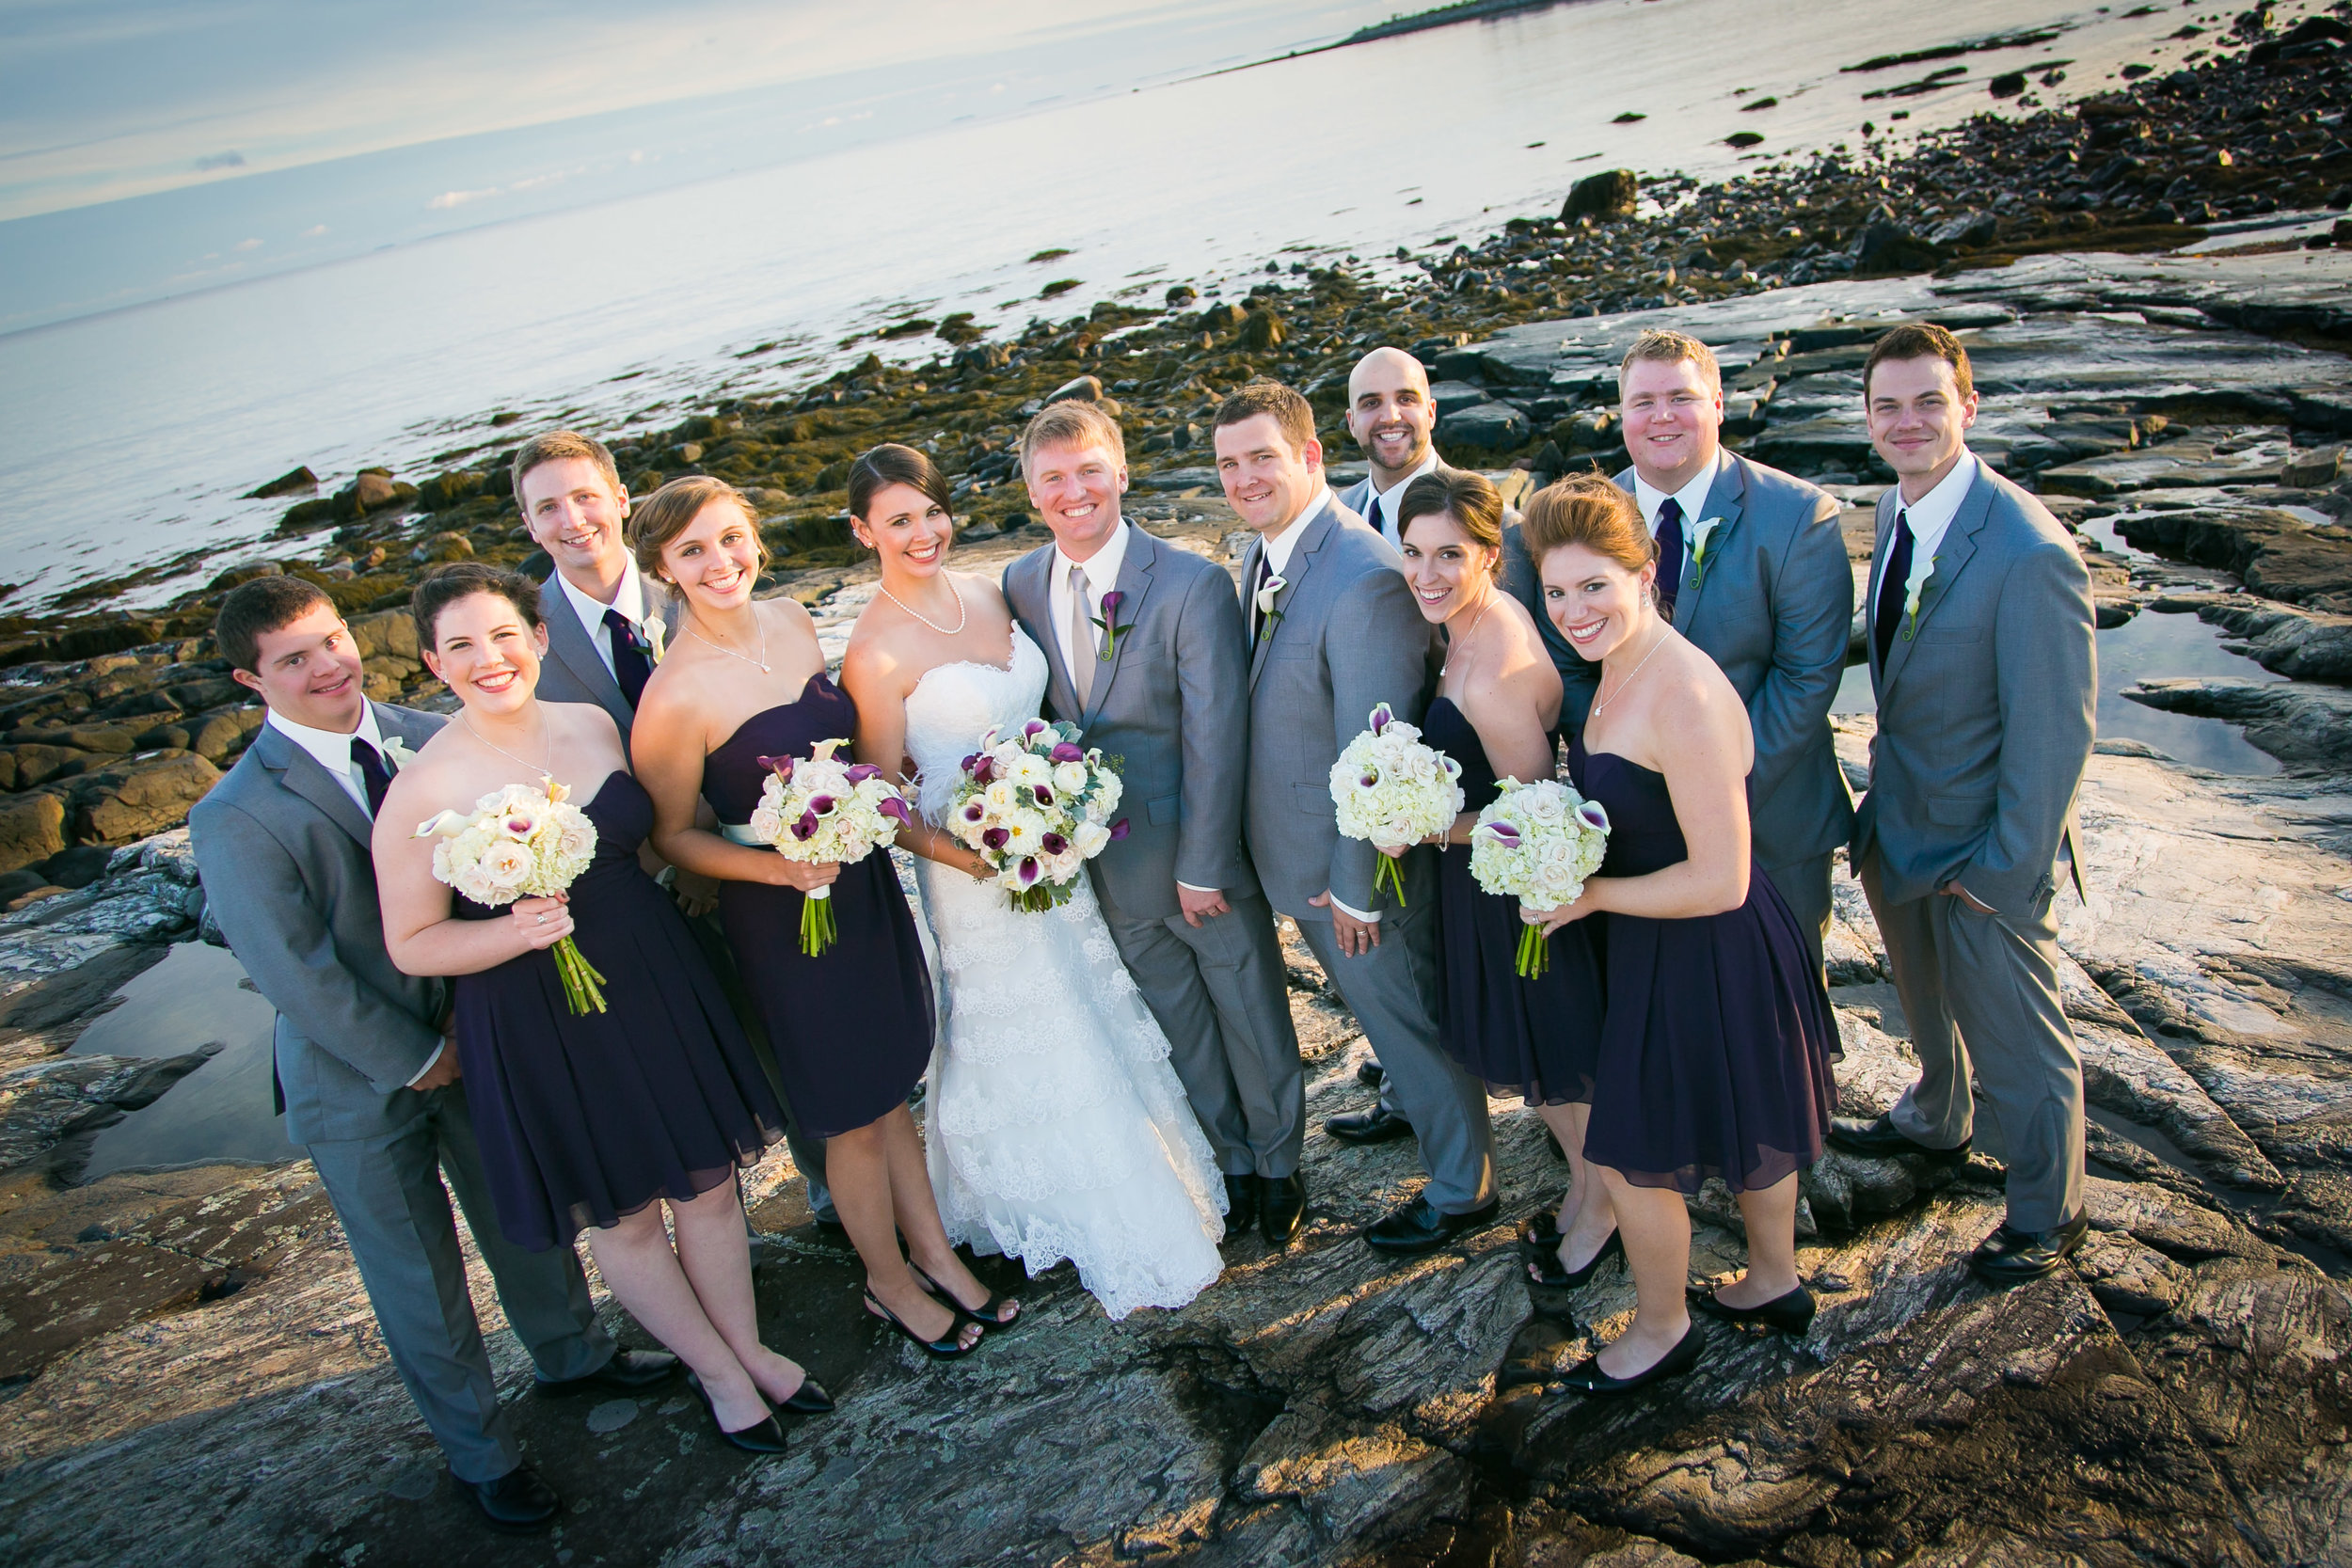 16-NH-Seacoast-wedding-photography242.jpg